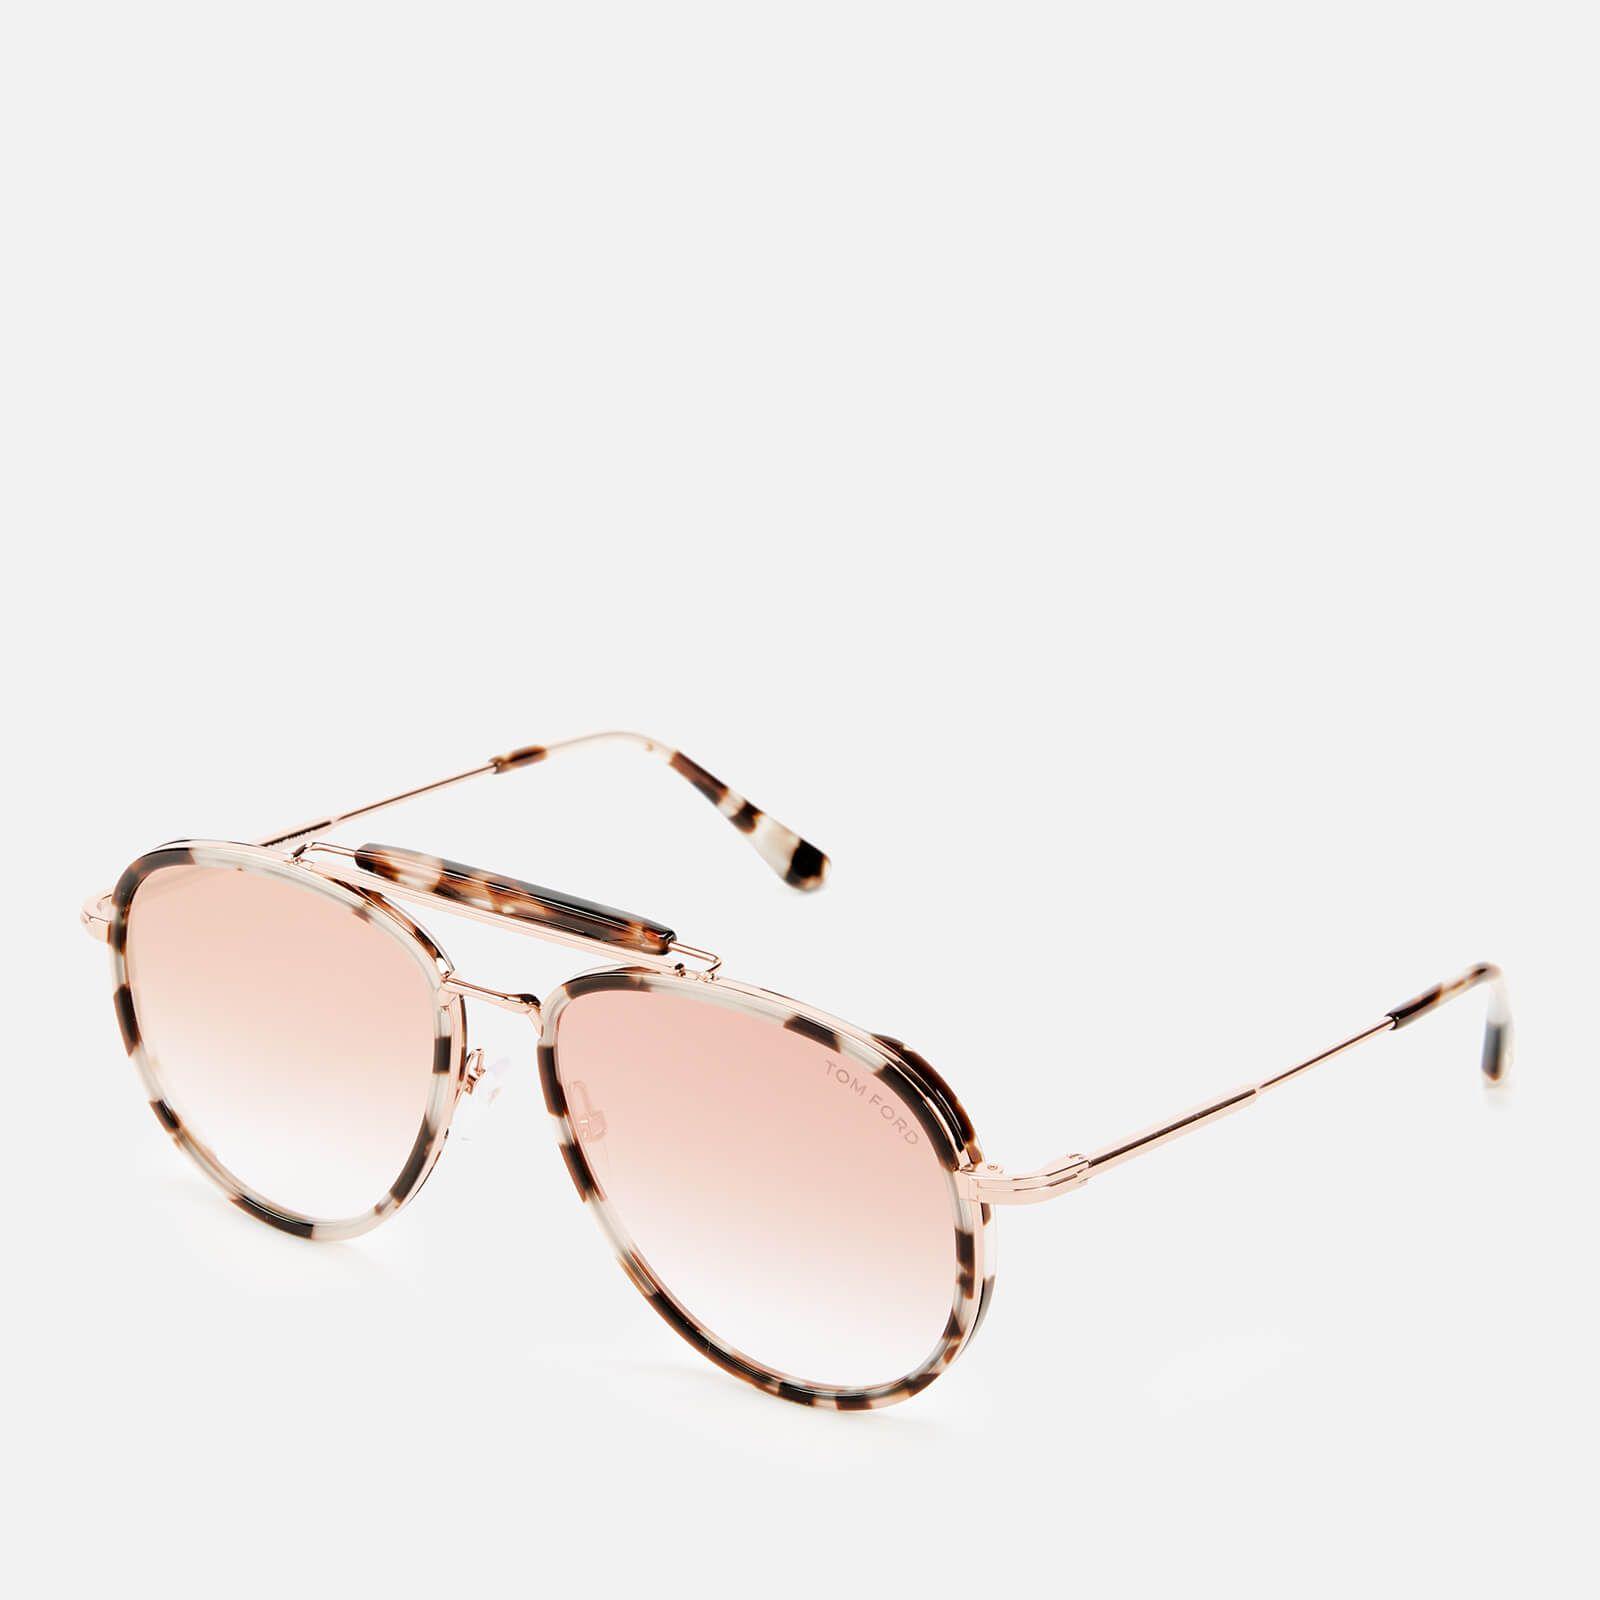 Tom Ford Women's Tripp Sunglasses - Coloured Havana/Gradient